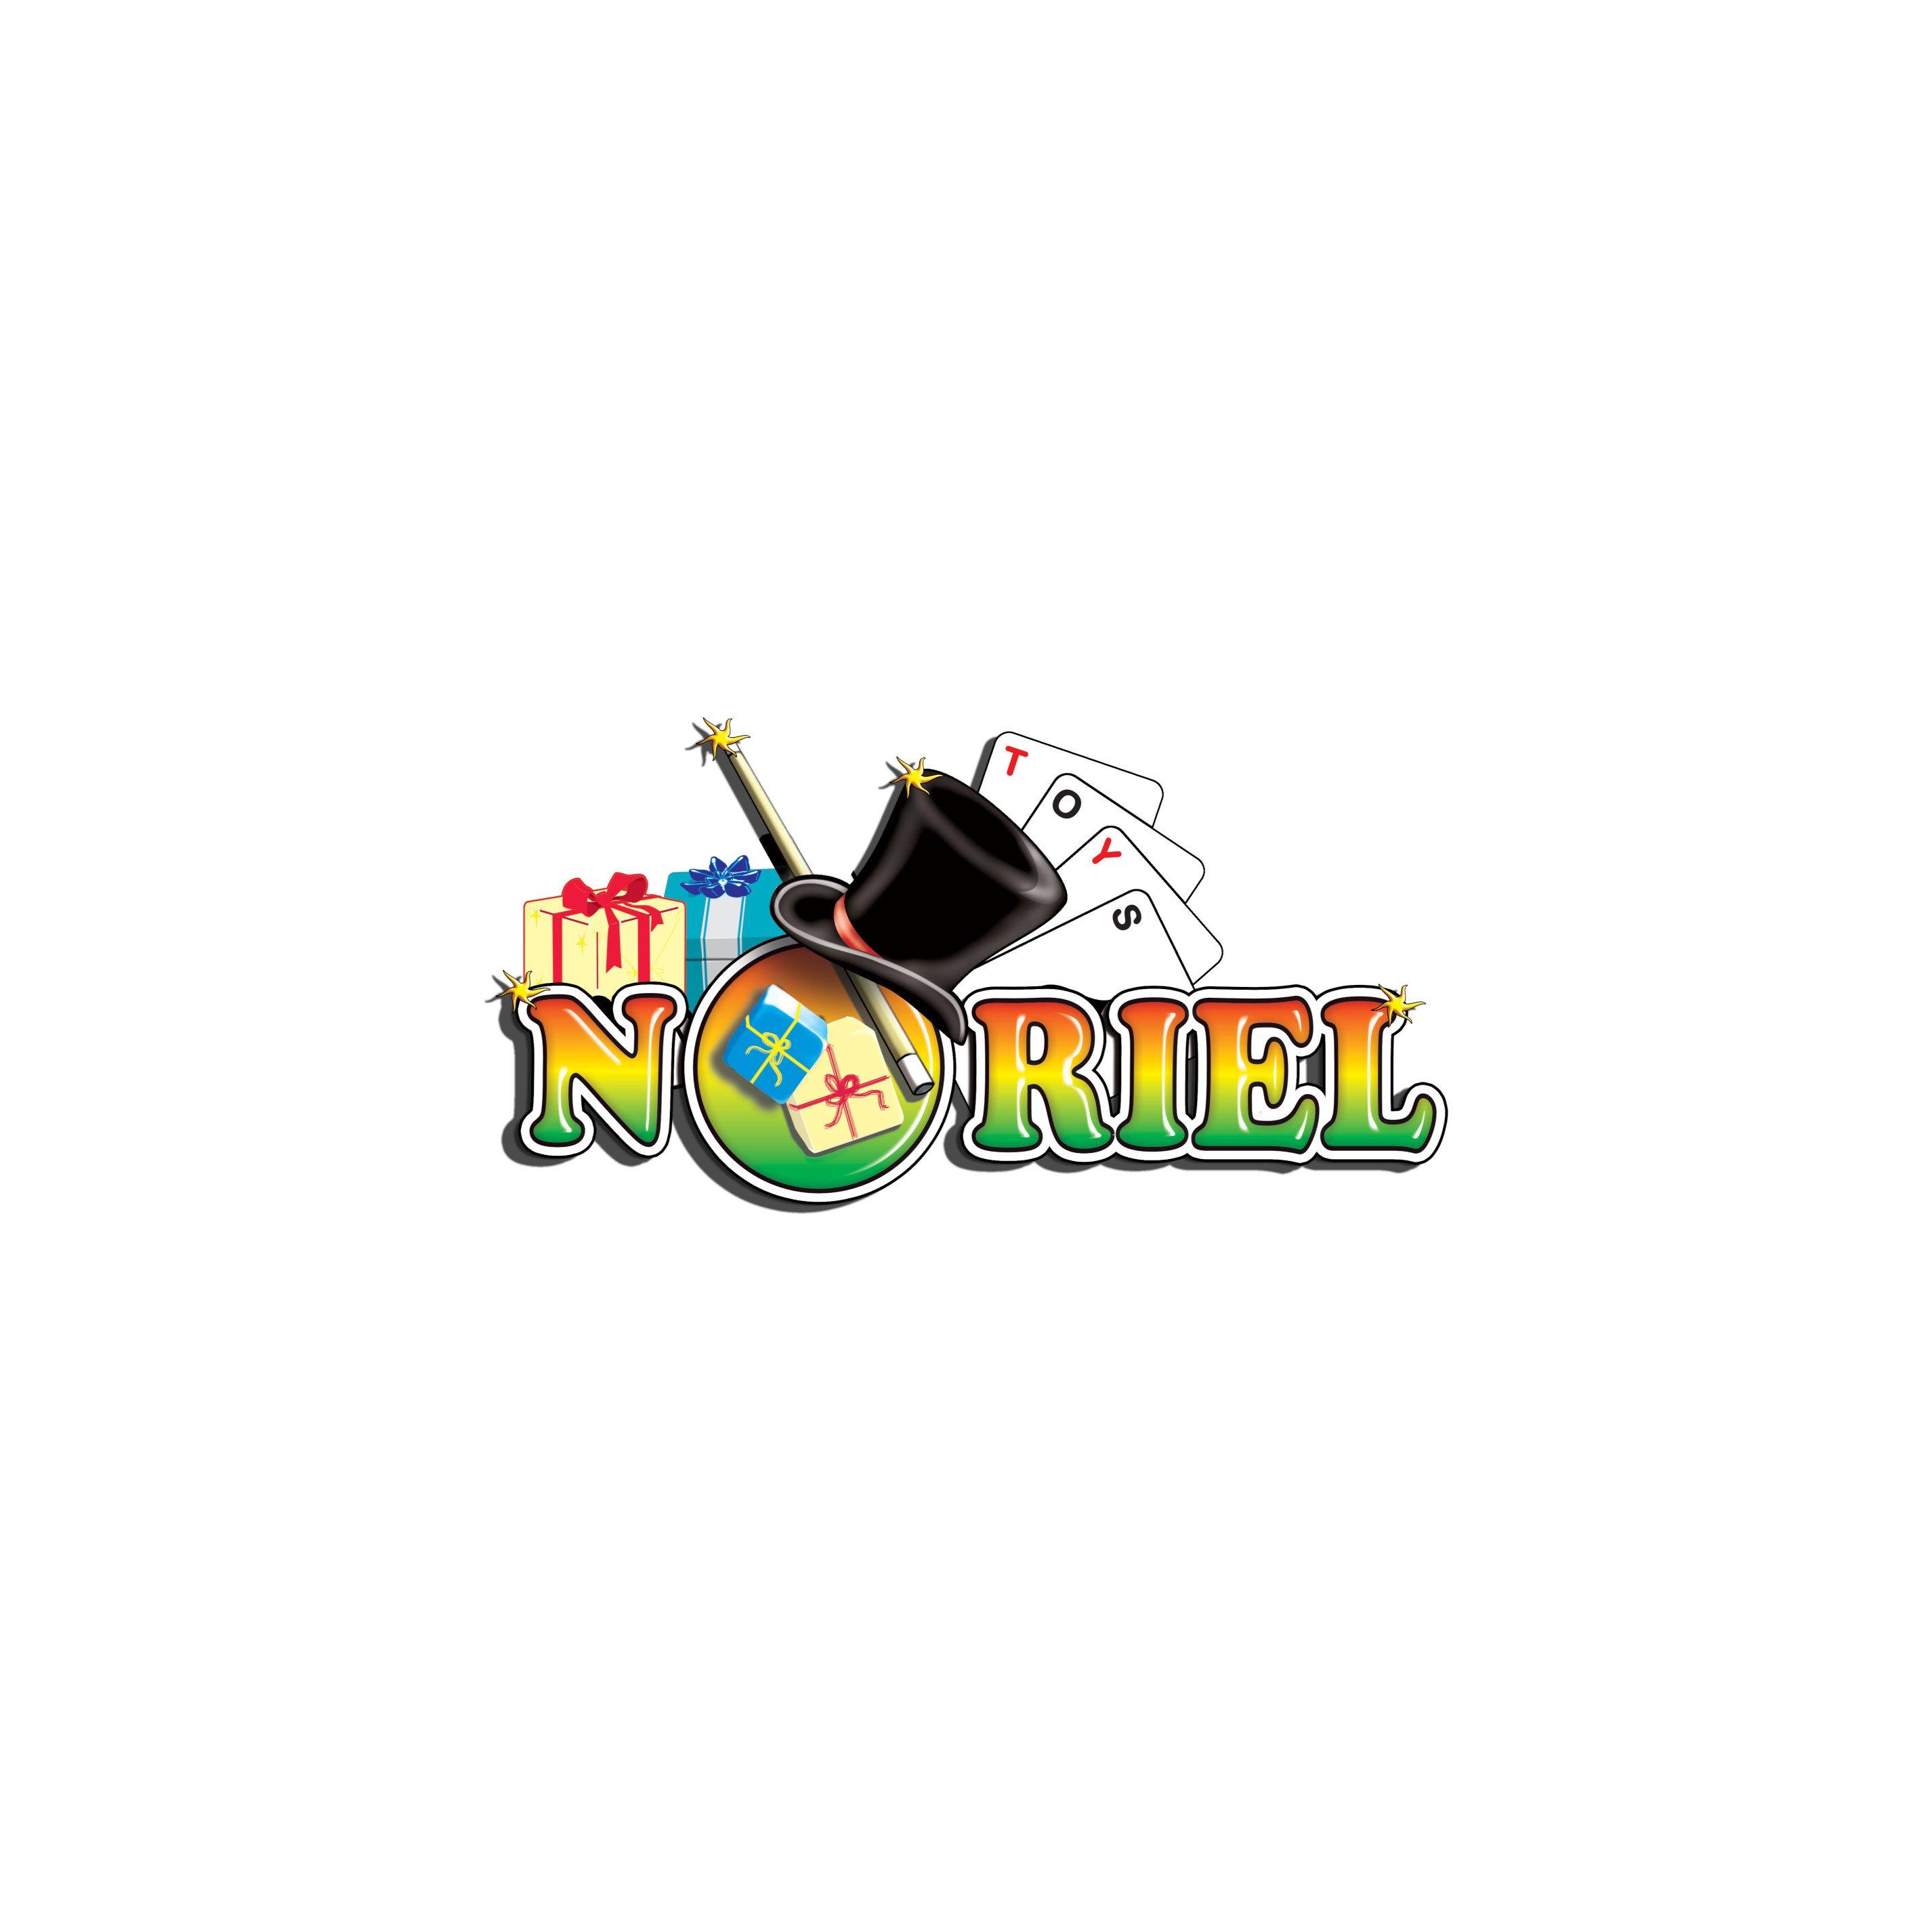 21572_2018_010w Masinuta Hot Wheels Monster Jam, Big Kahuna, FLX06